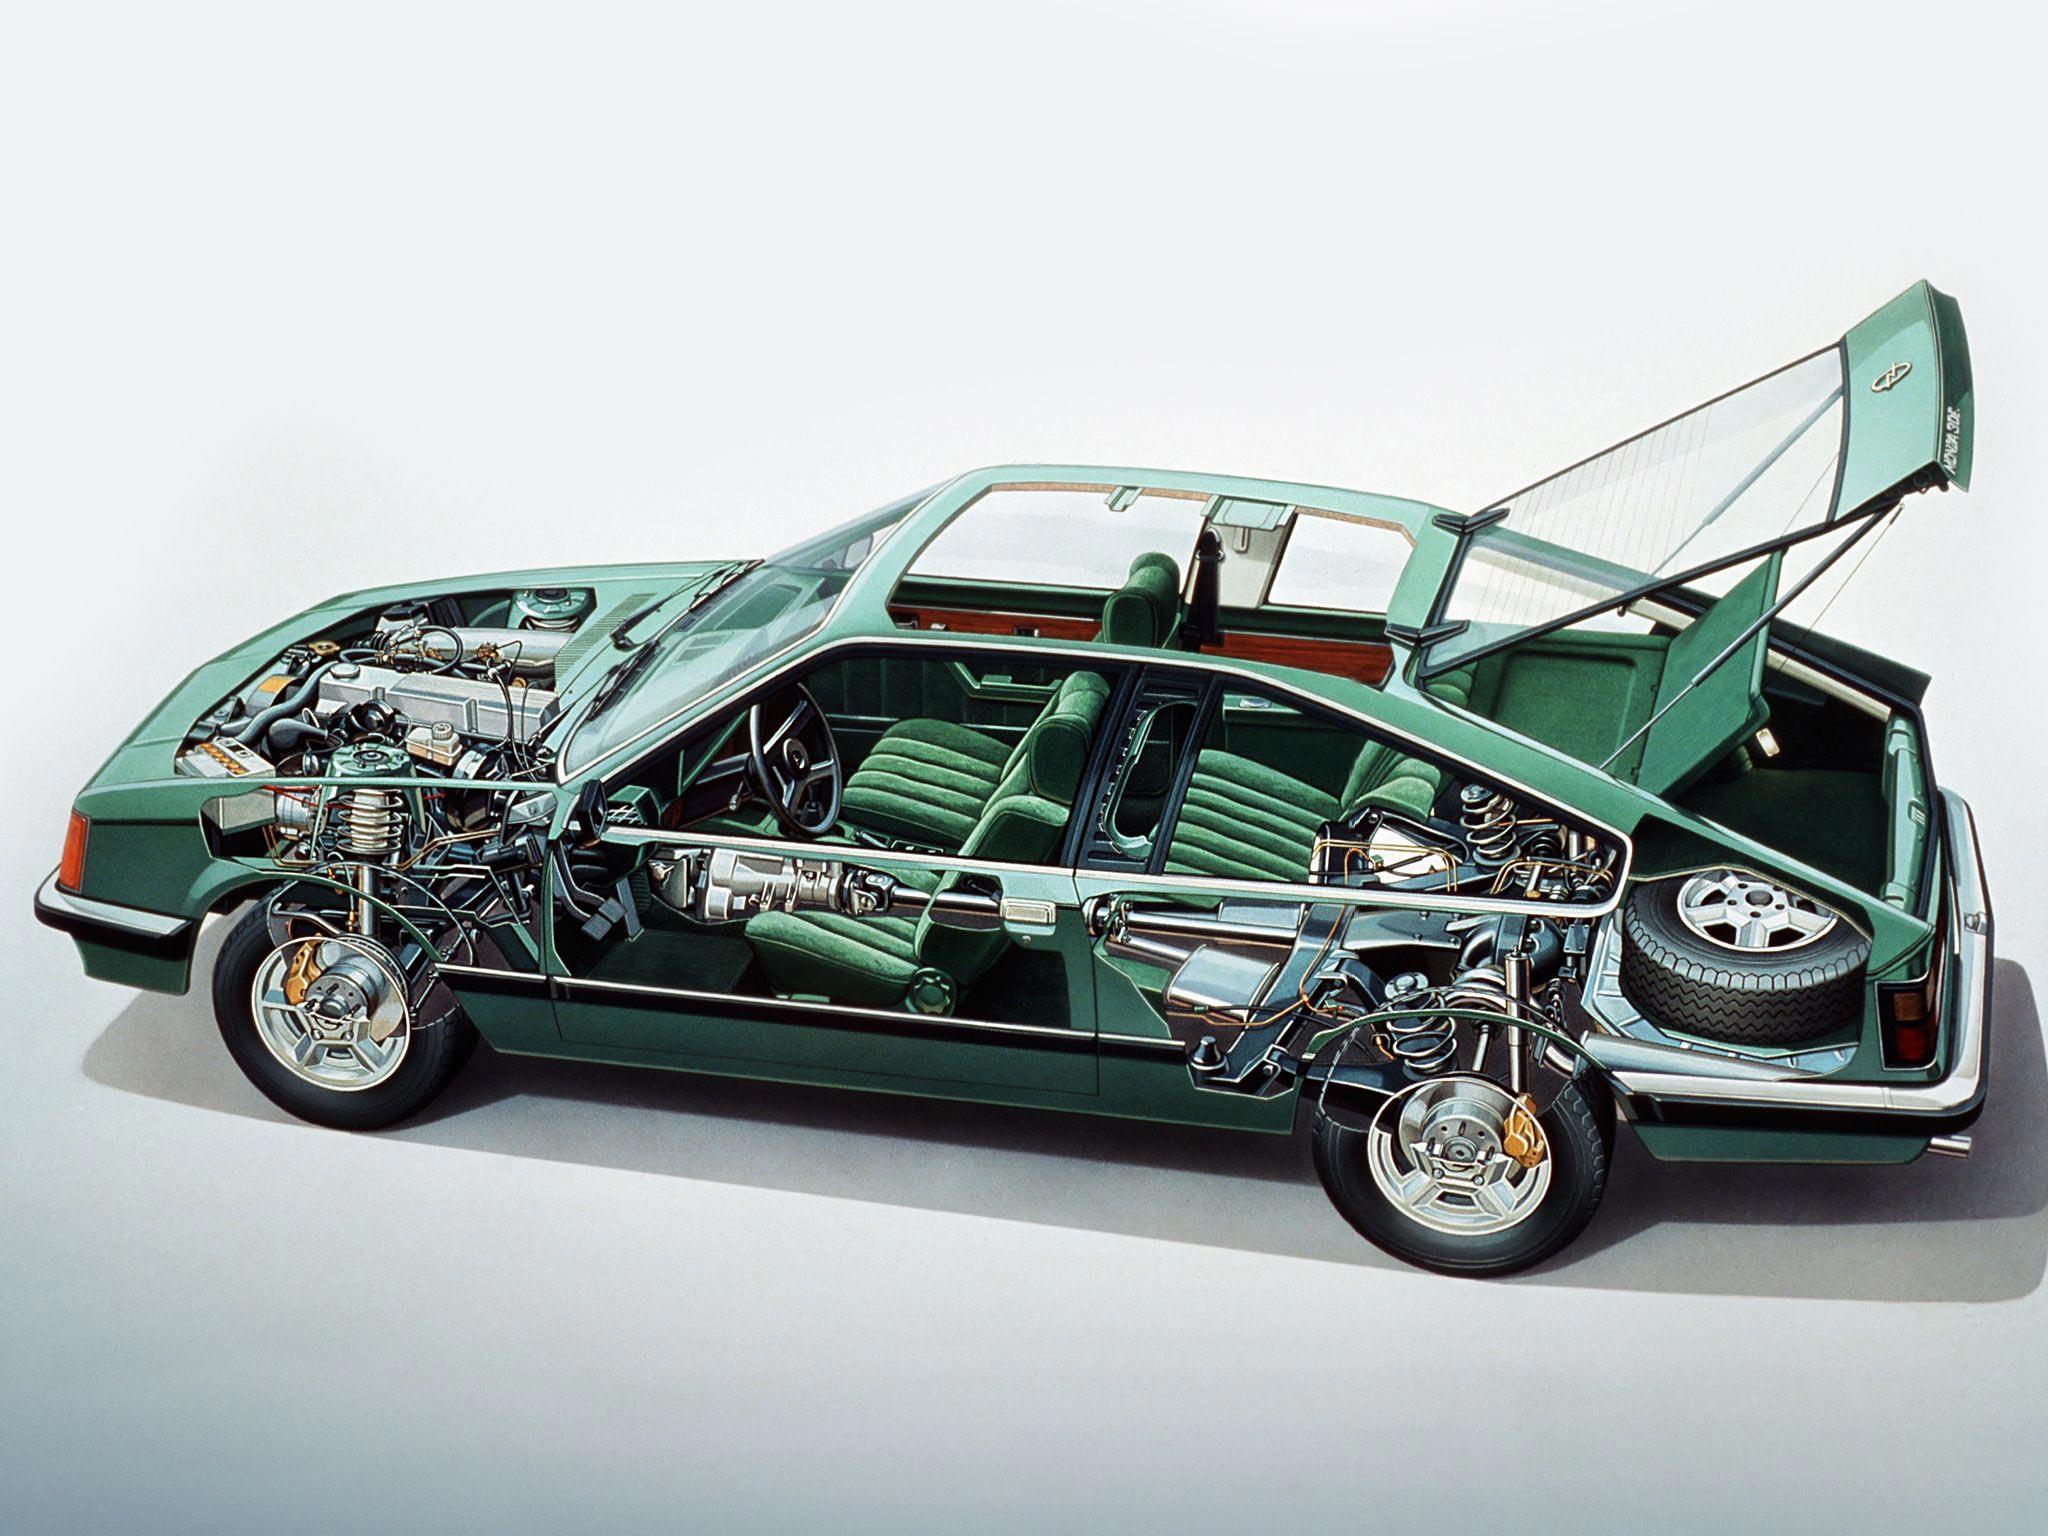 Opel Monza cutaway